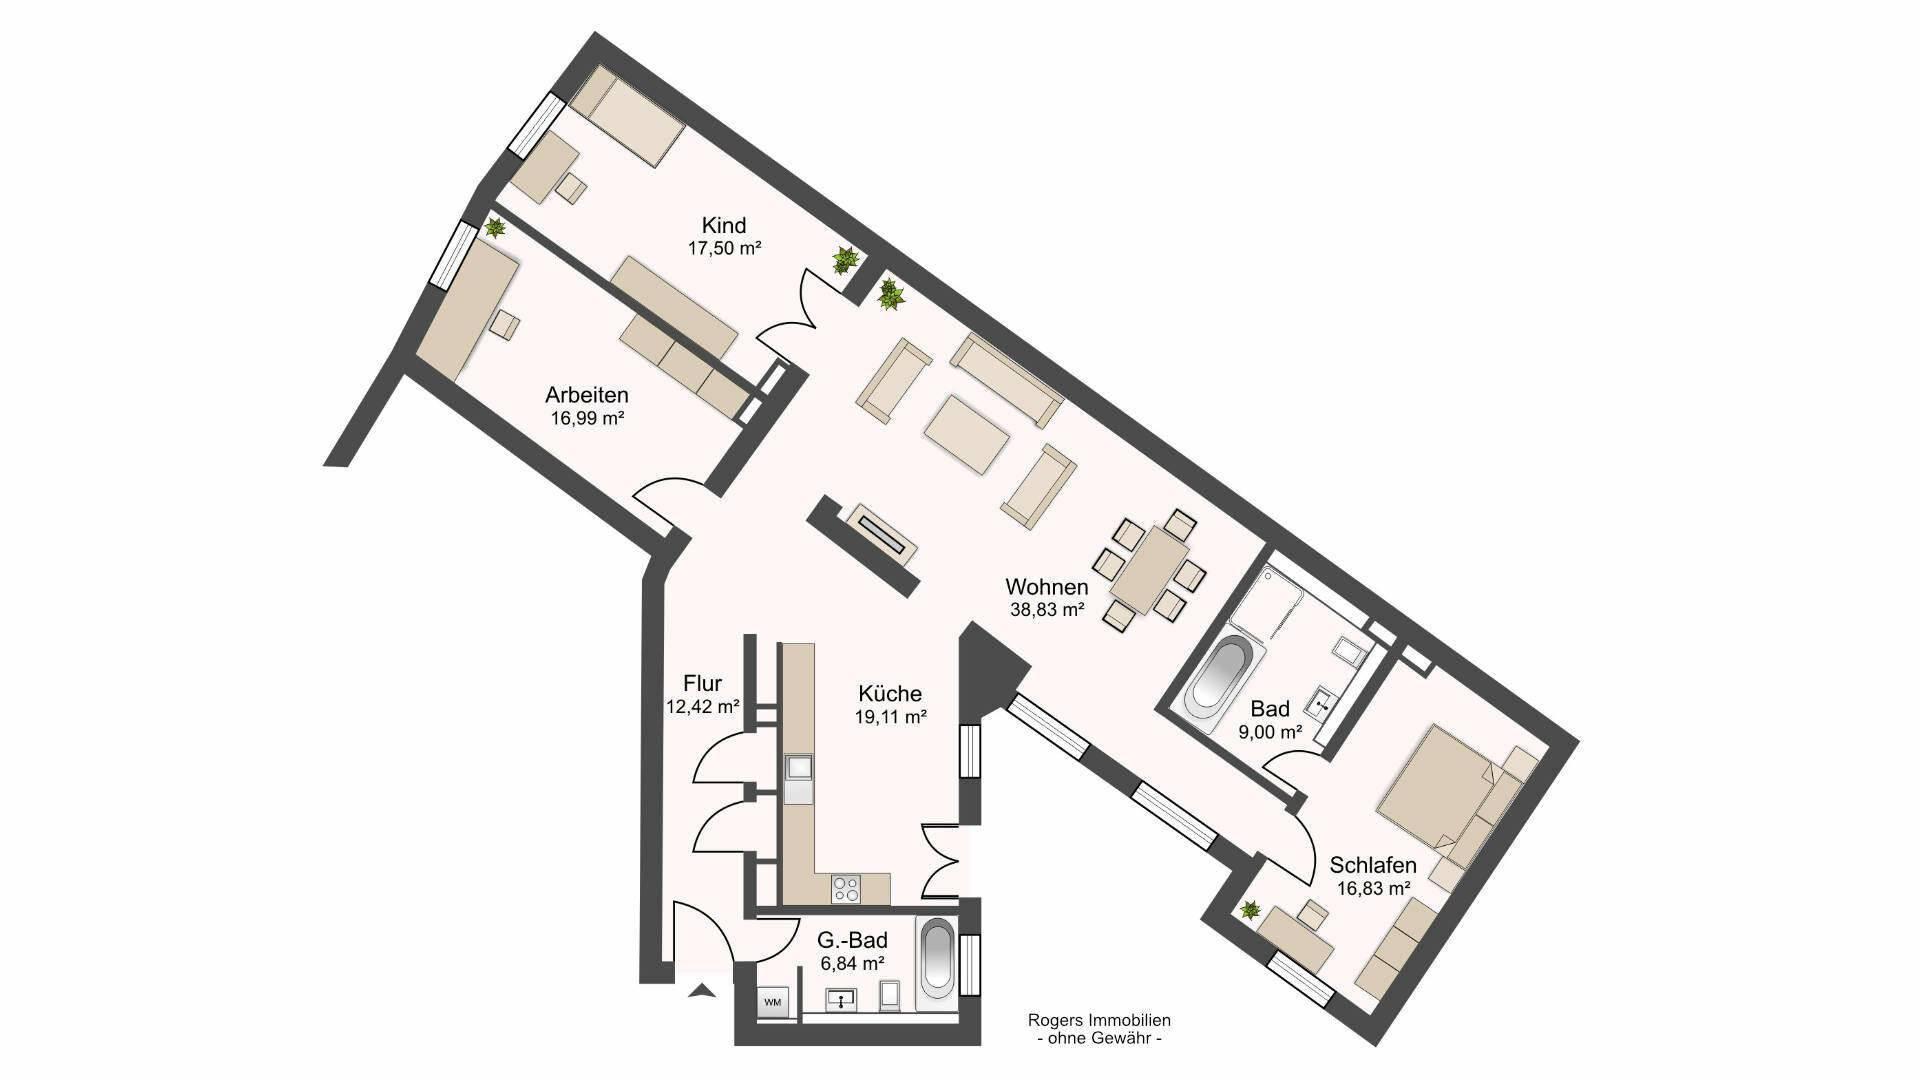 Au Altbauwohnung Grundriss